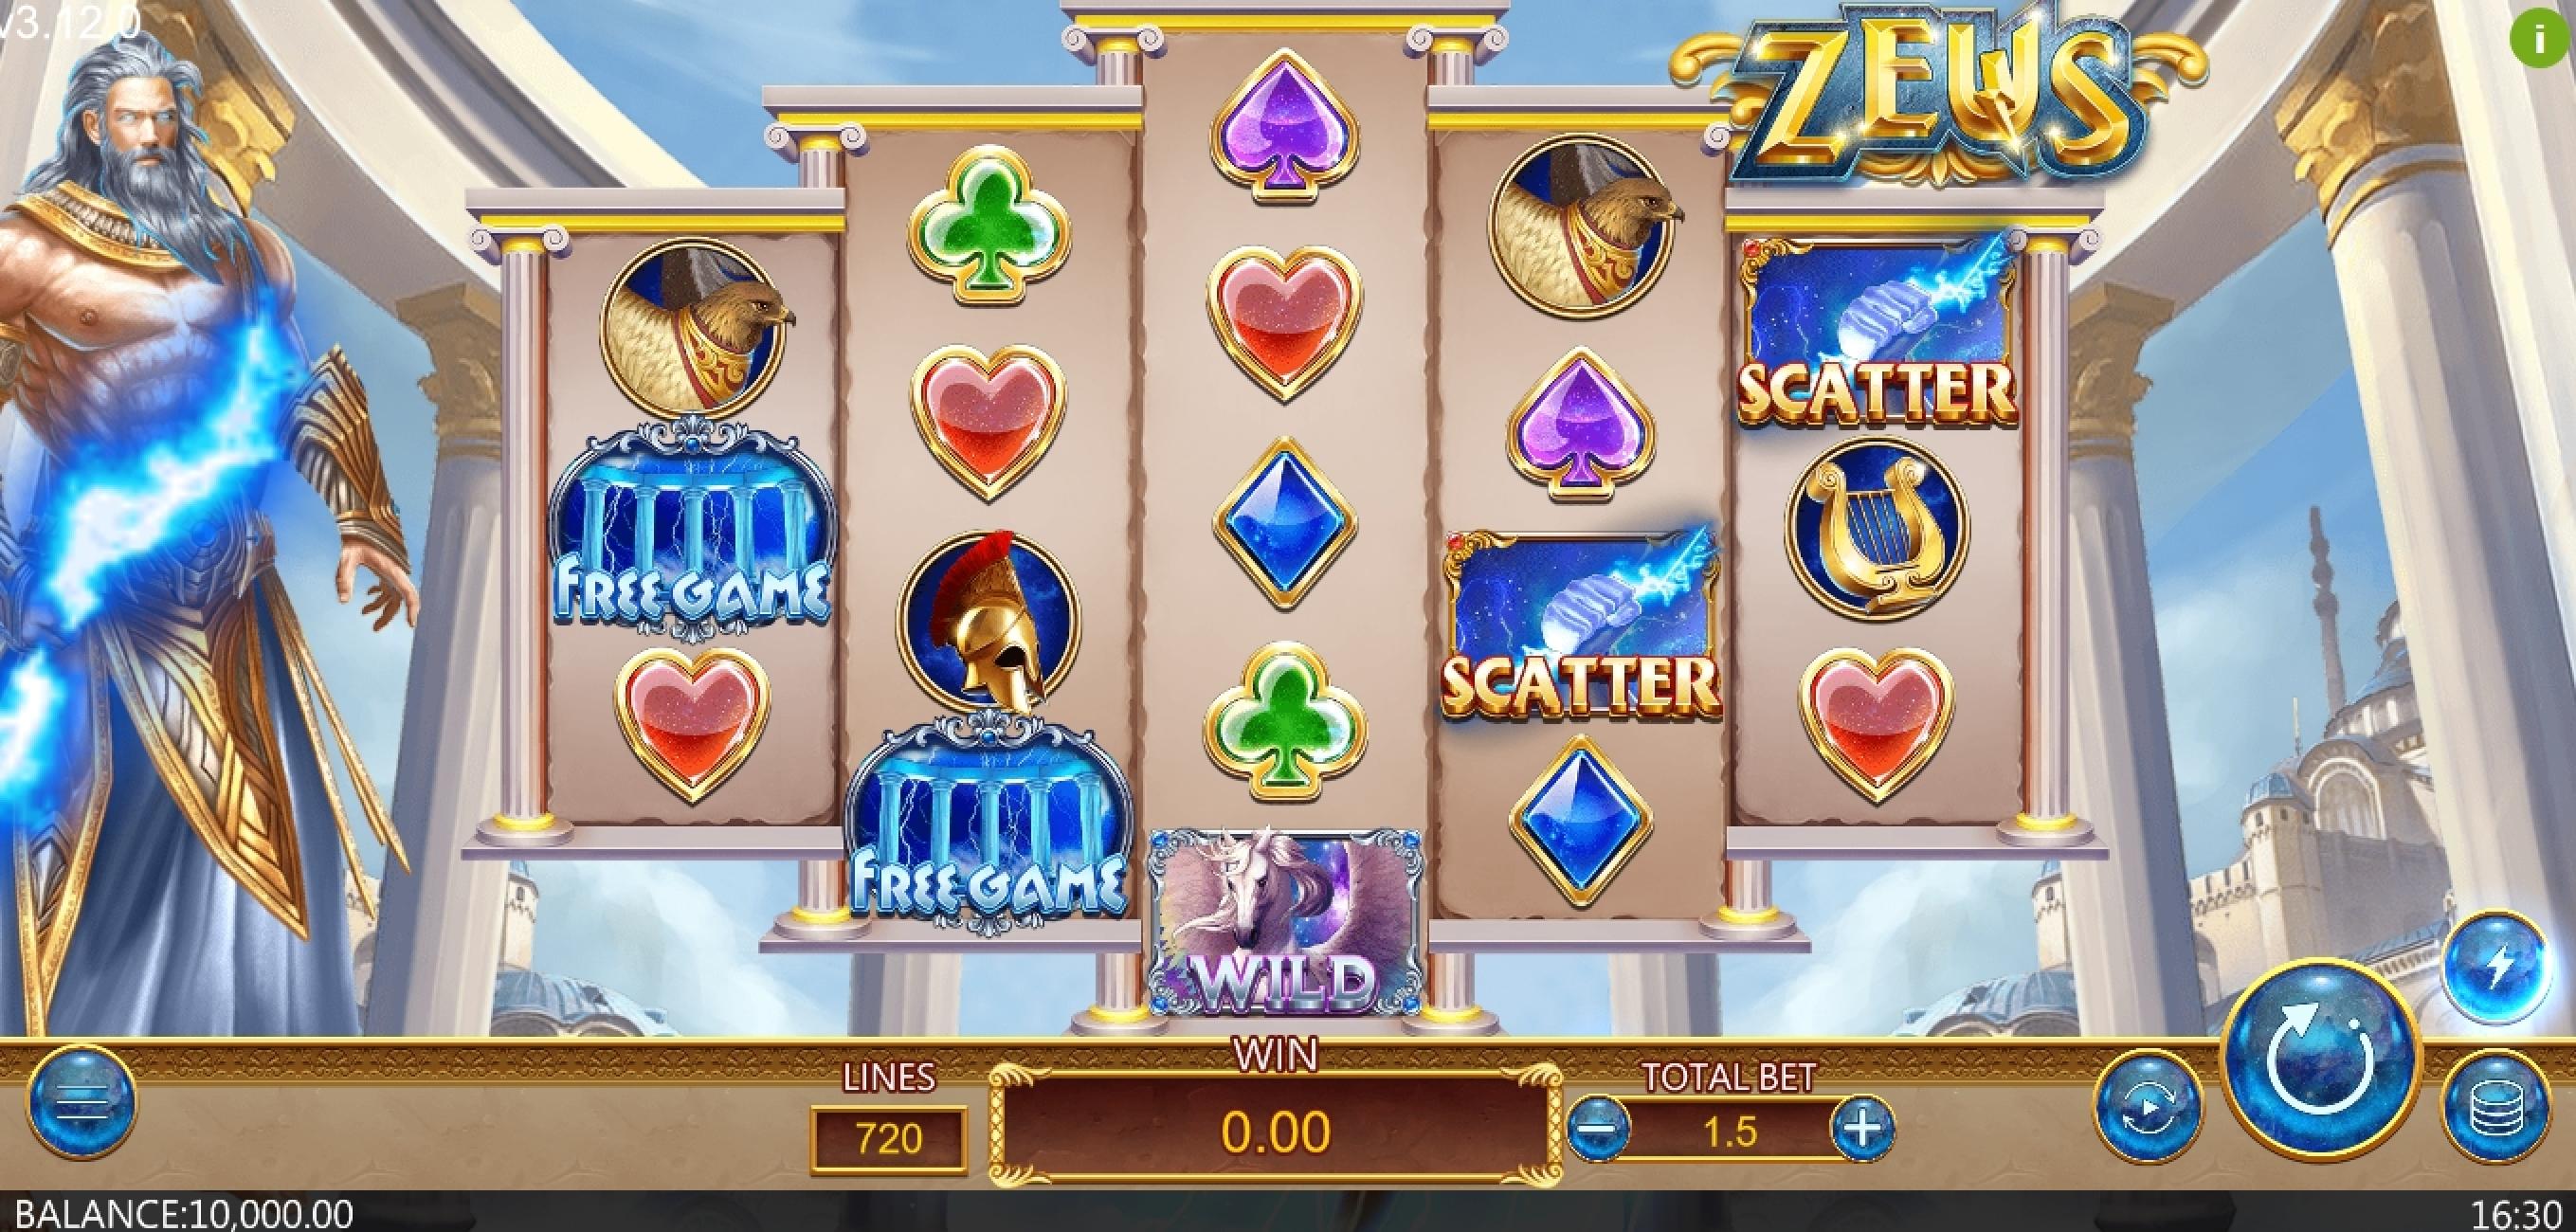 Zeus (Dragoon Soft) สาธิตการเล่นฟรี ✓ สล็อตแมชชีนออนไลน์โดย Dragoon Soft Review